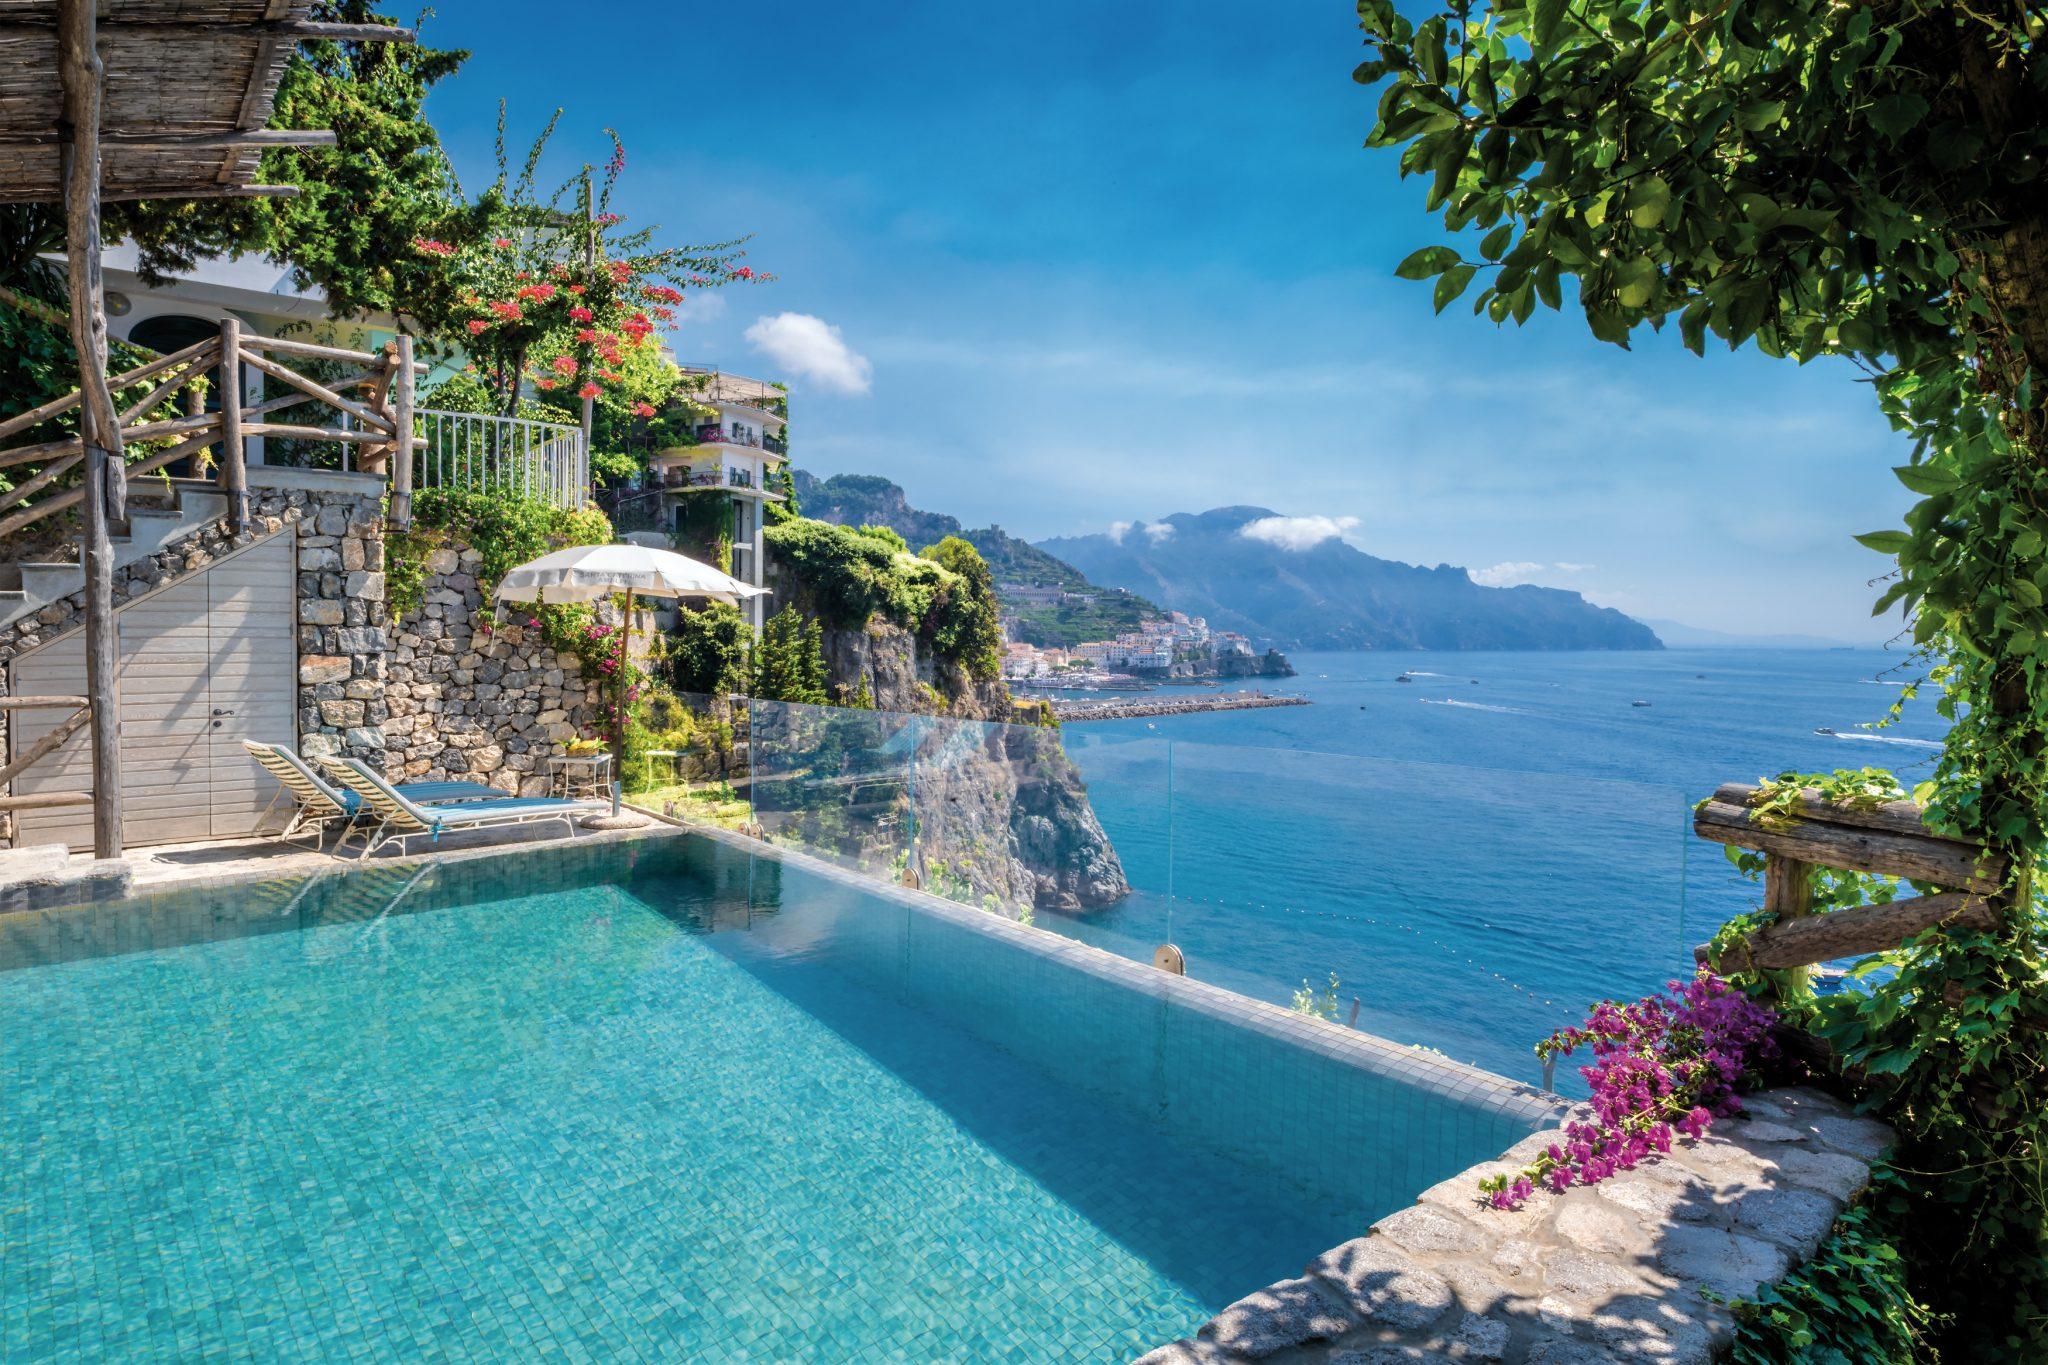 Amalfi Coast Hotels The Best Hotels On The Amalfi Coast For